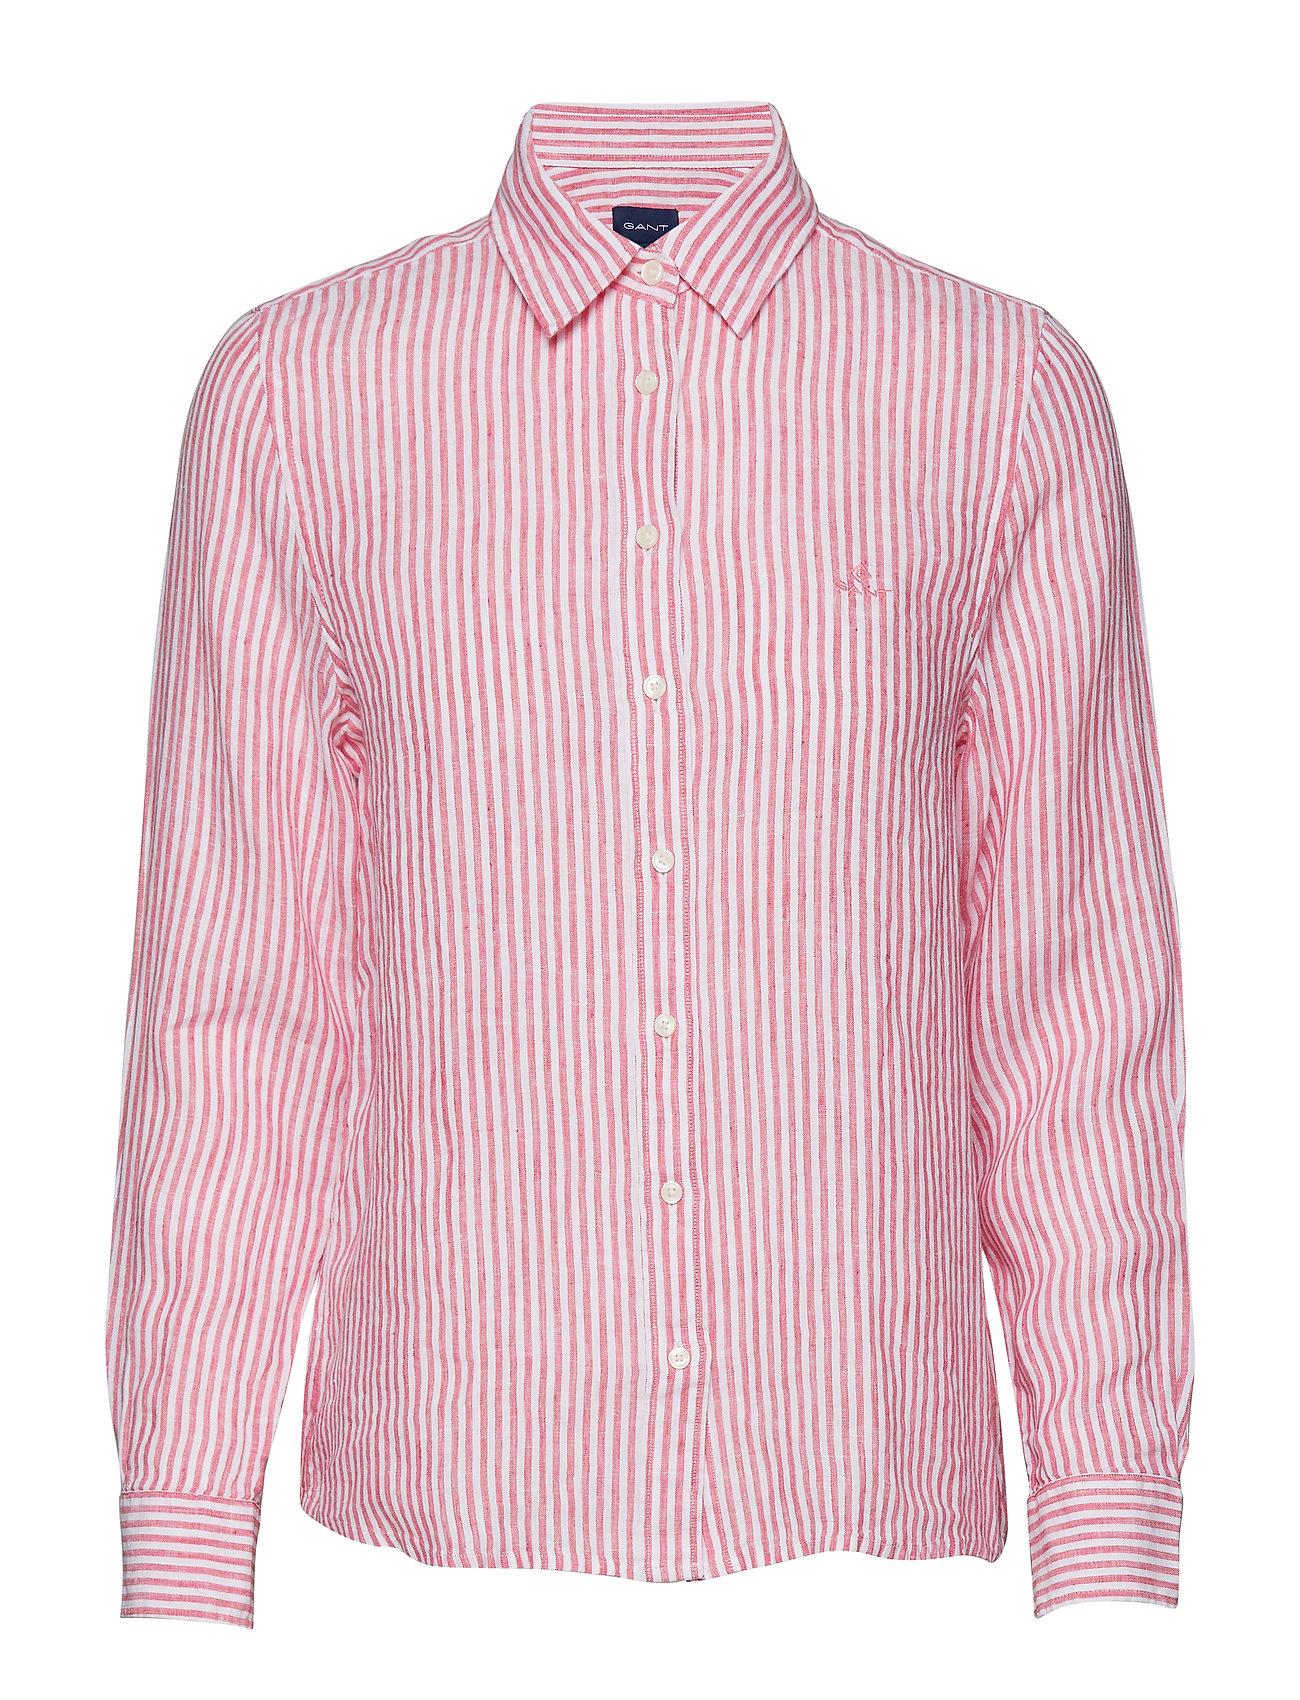 c4638884b1 The Linen Chambray Stripe Shirt (Watermelon Red) (£76.30) - GANT ...